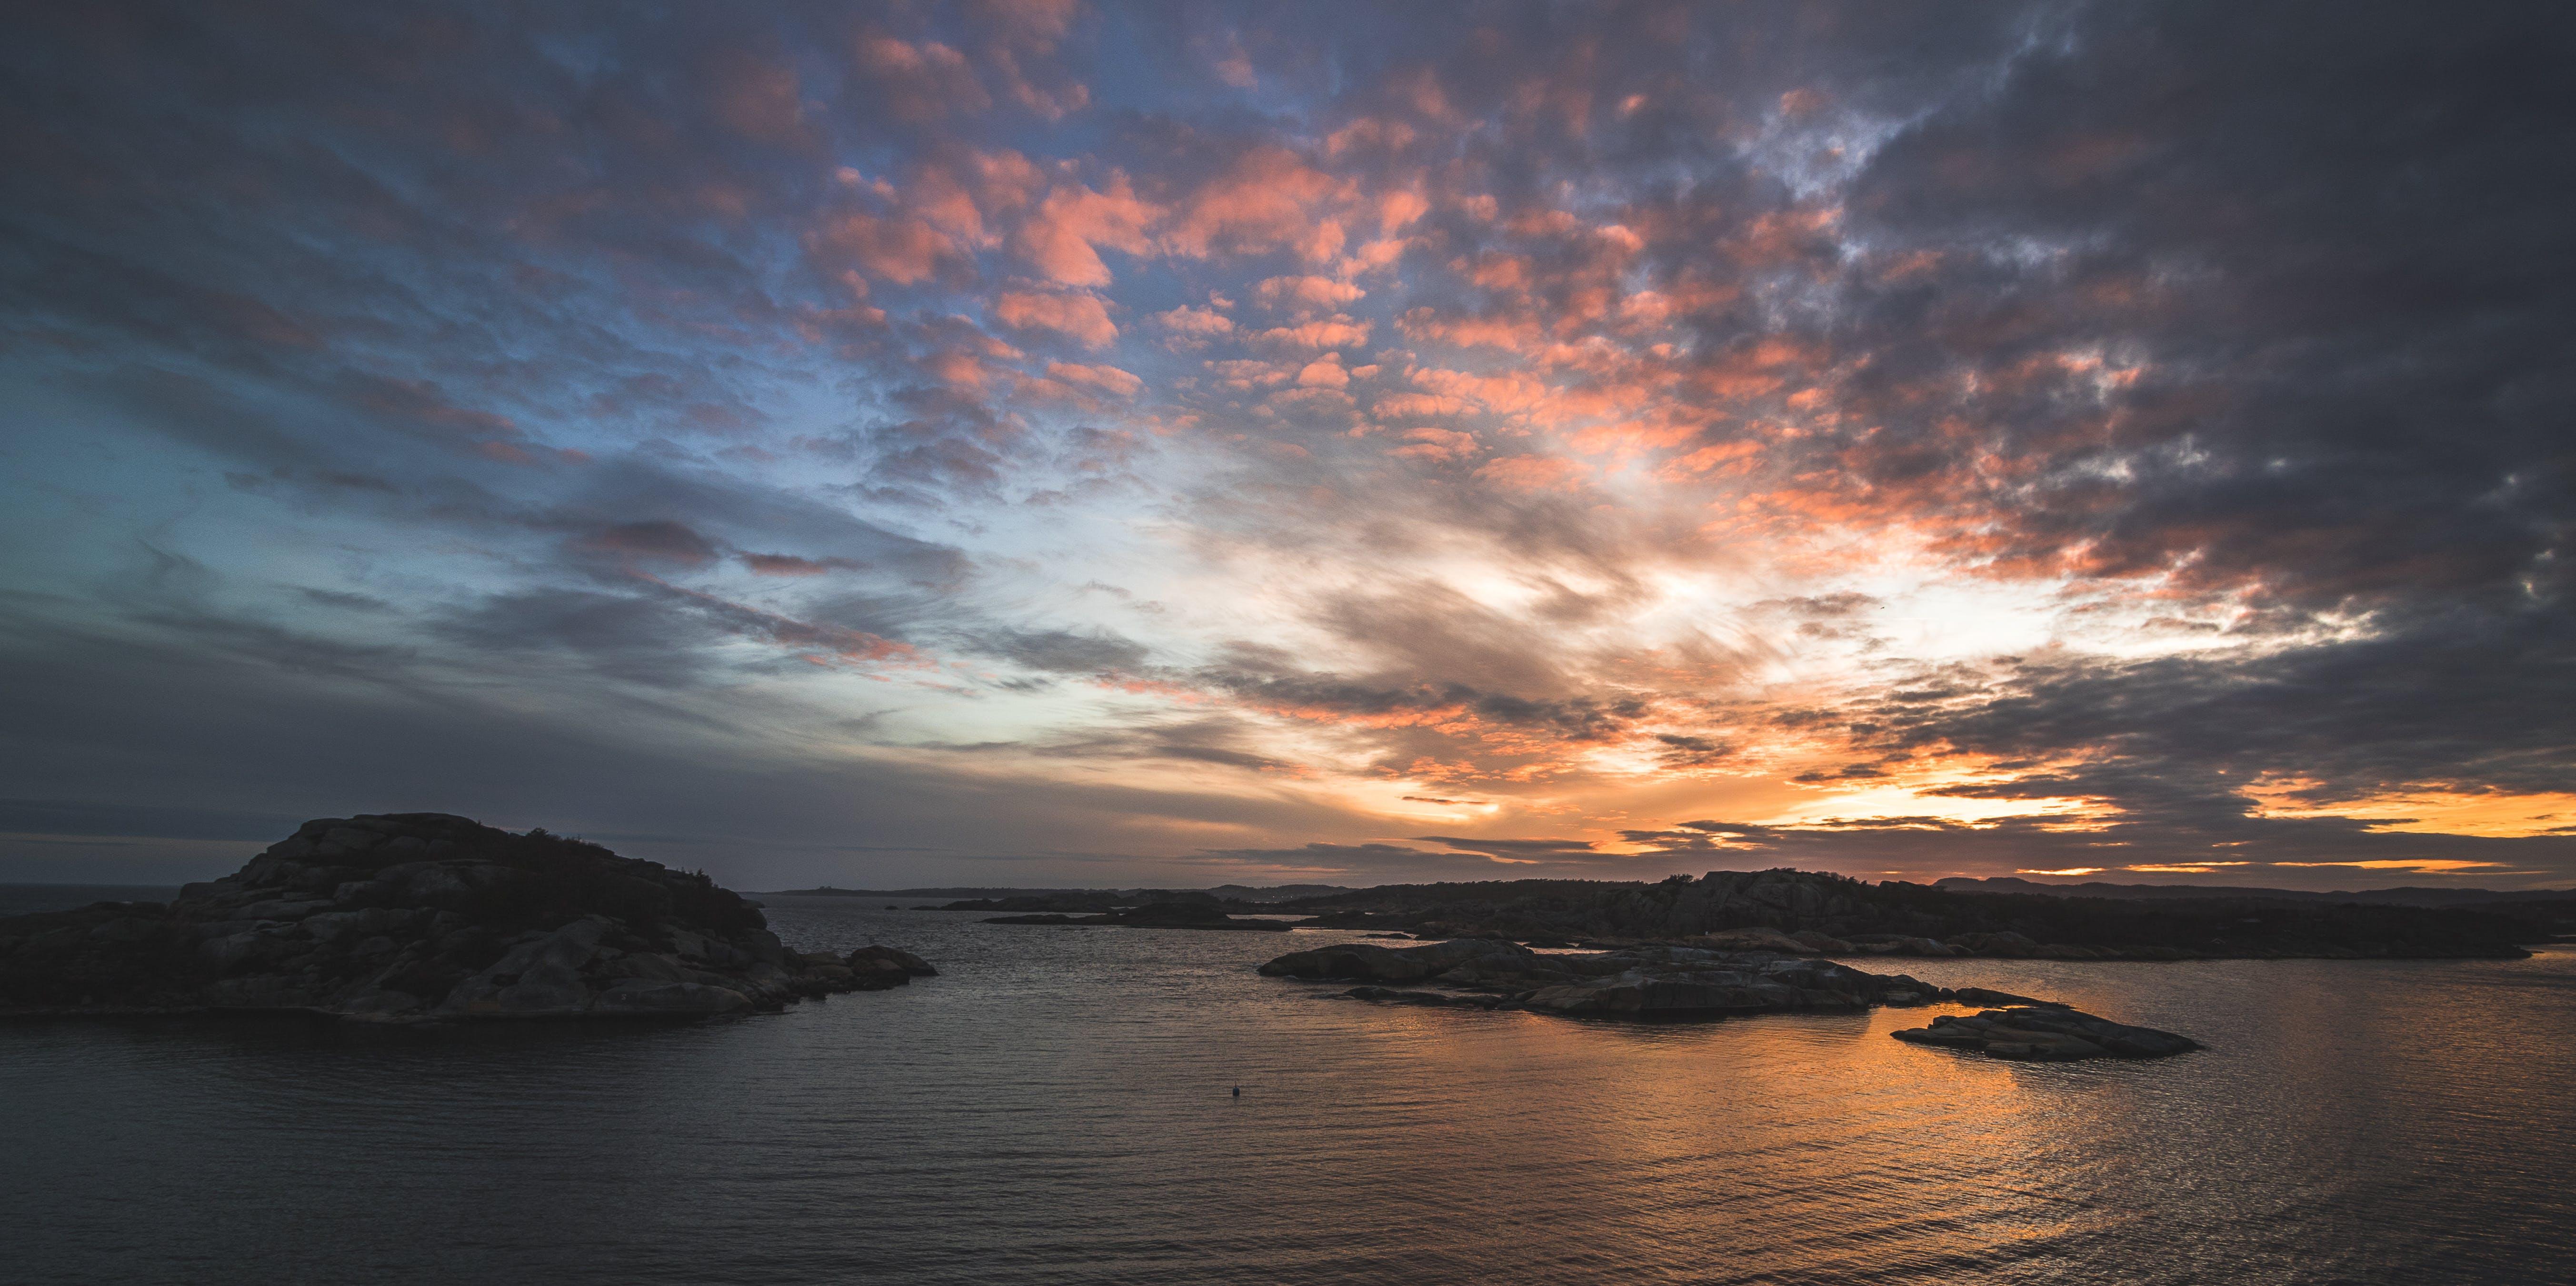 Body of Water Near Mountains Taken Under Orange Clouds during Sunset